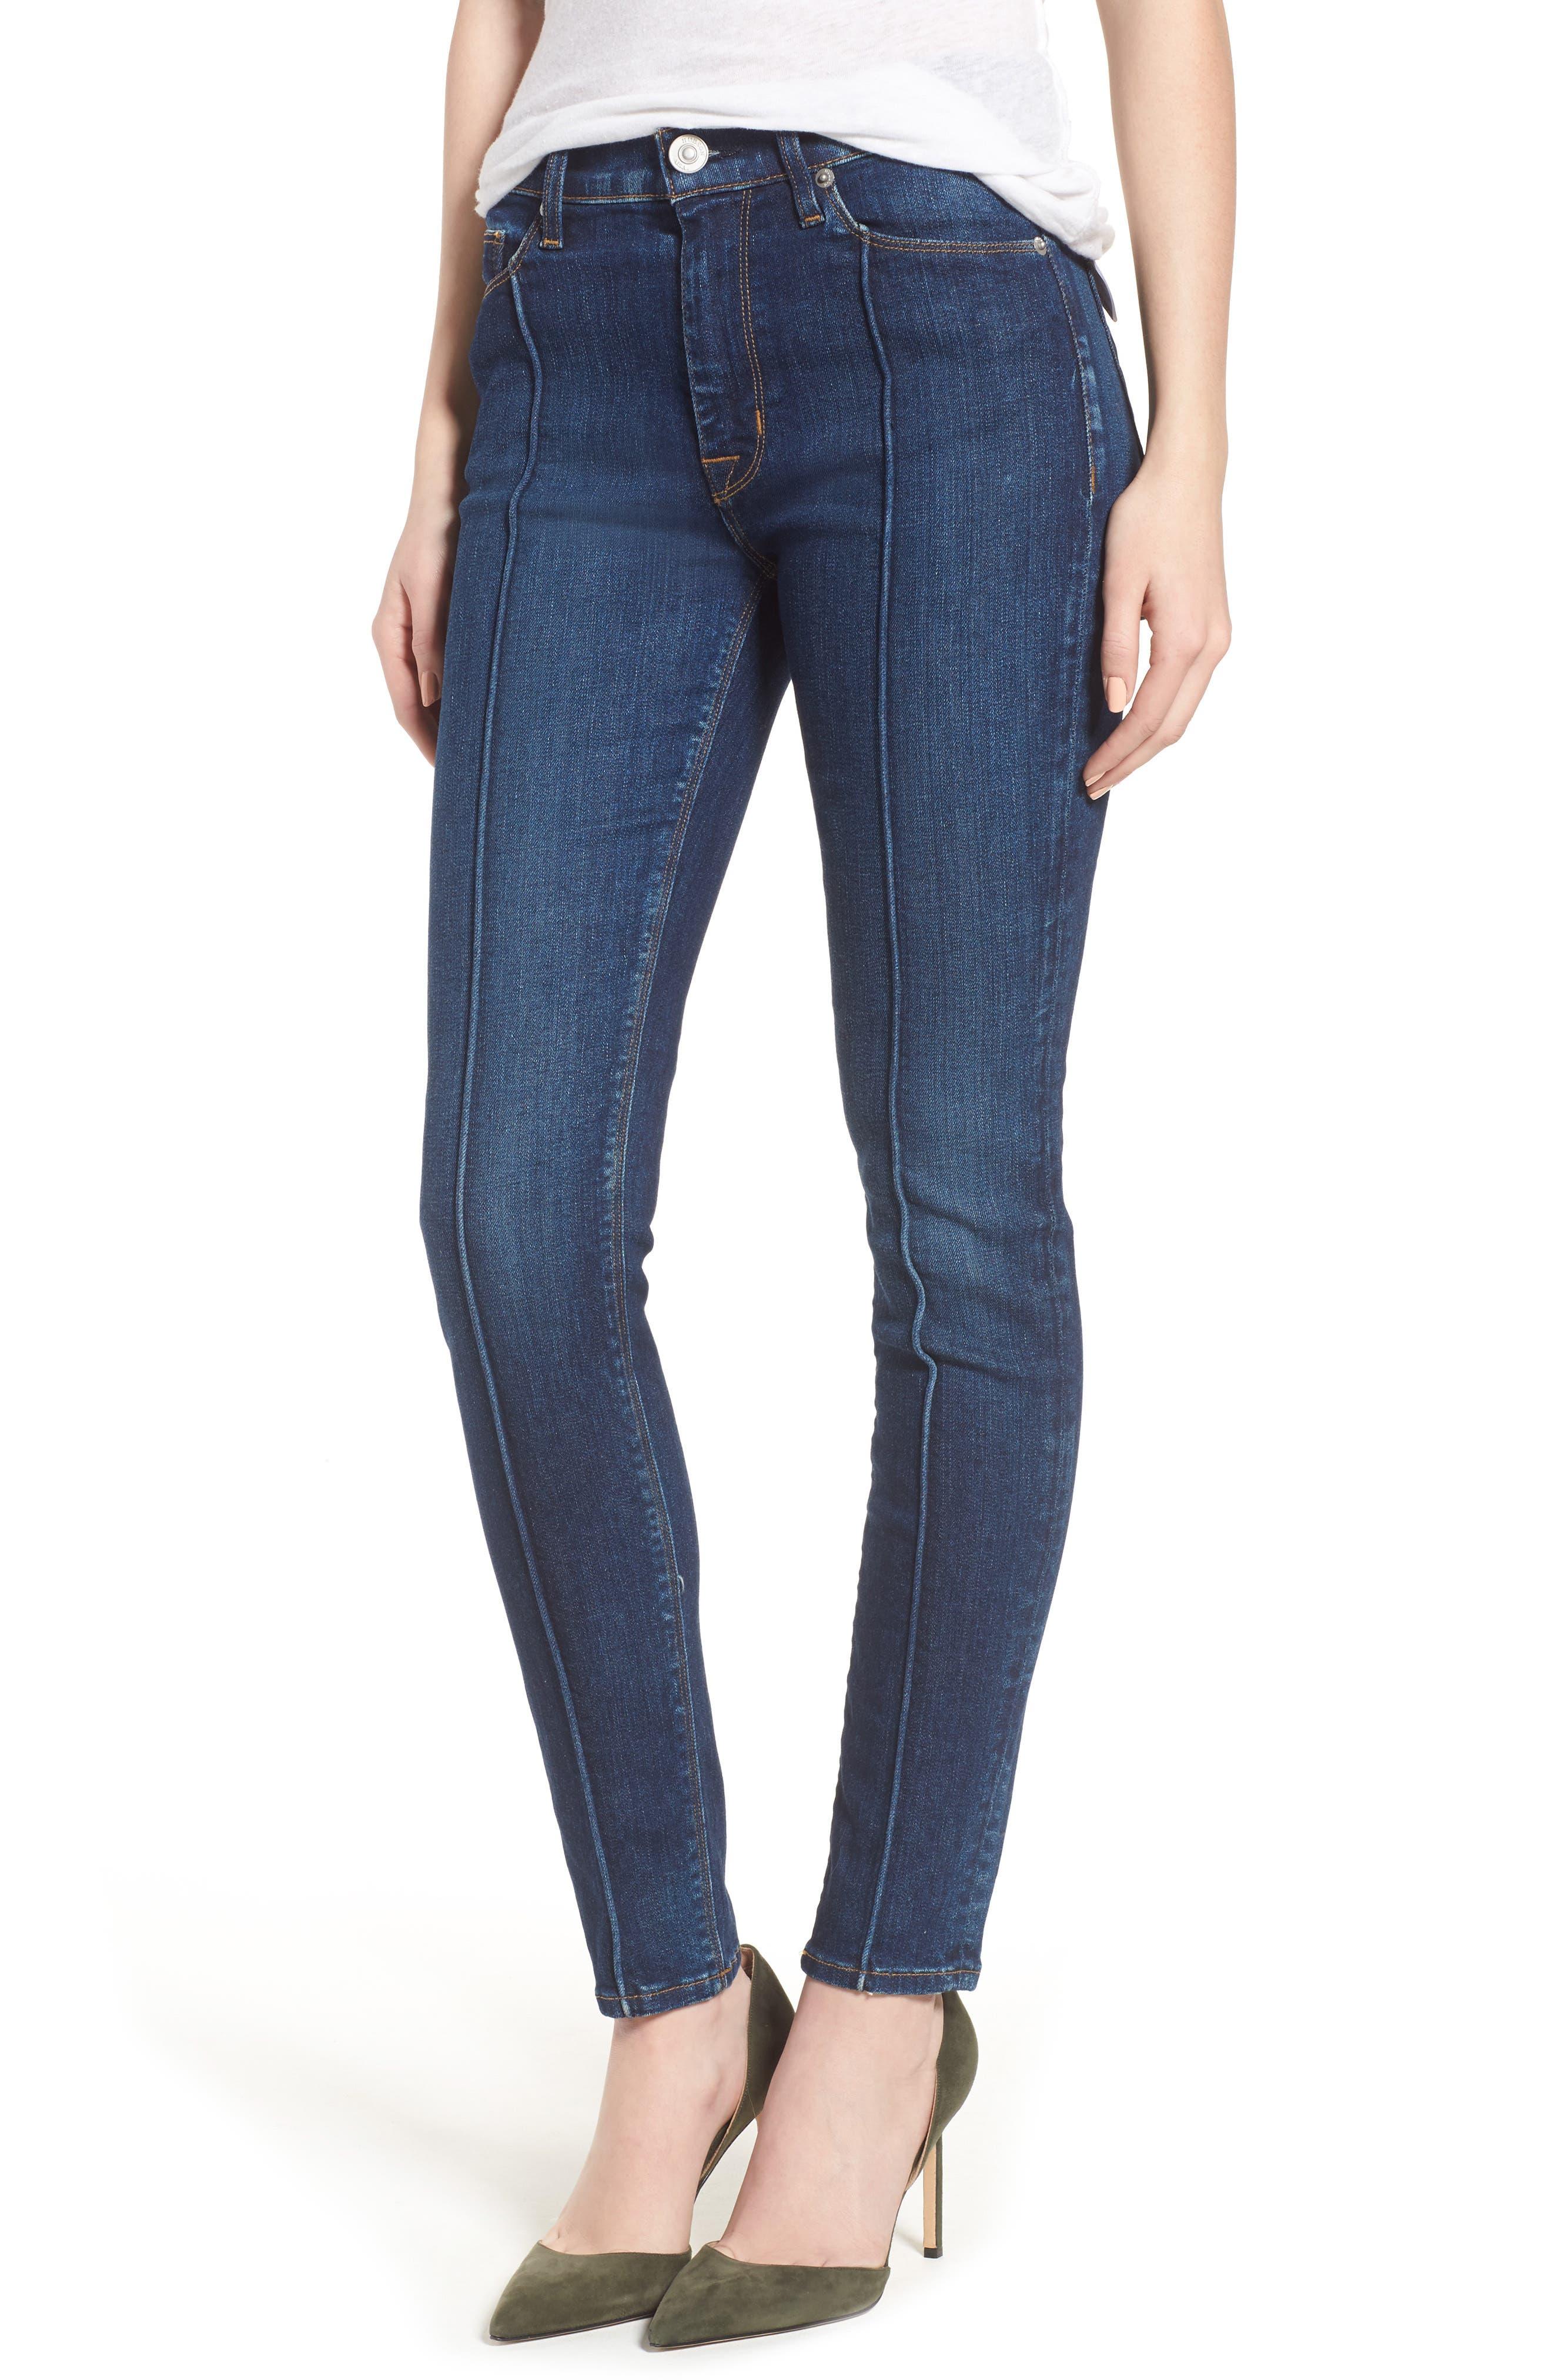 Alternate Image 1 Selected - Hudson Jeans Barbara Pintuck Super Skinny Jeans (Electra)